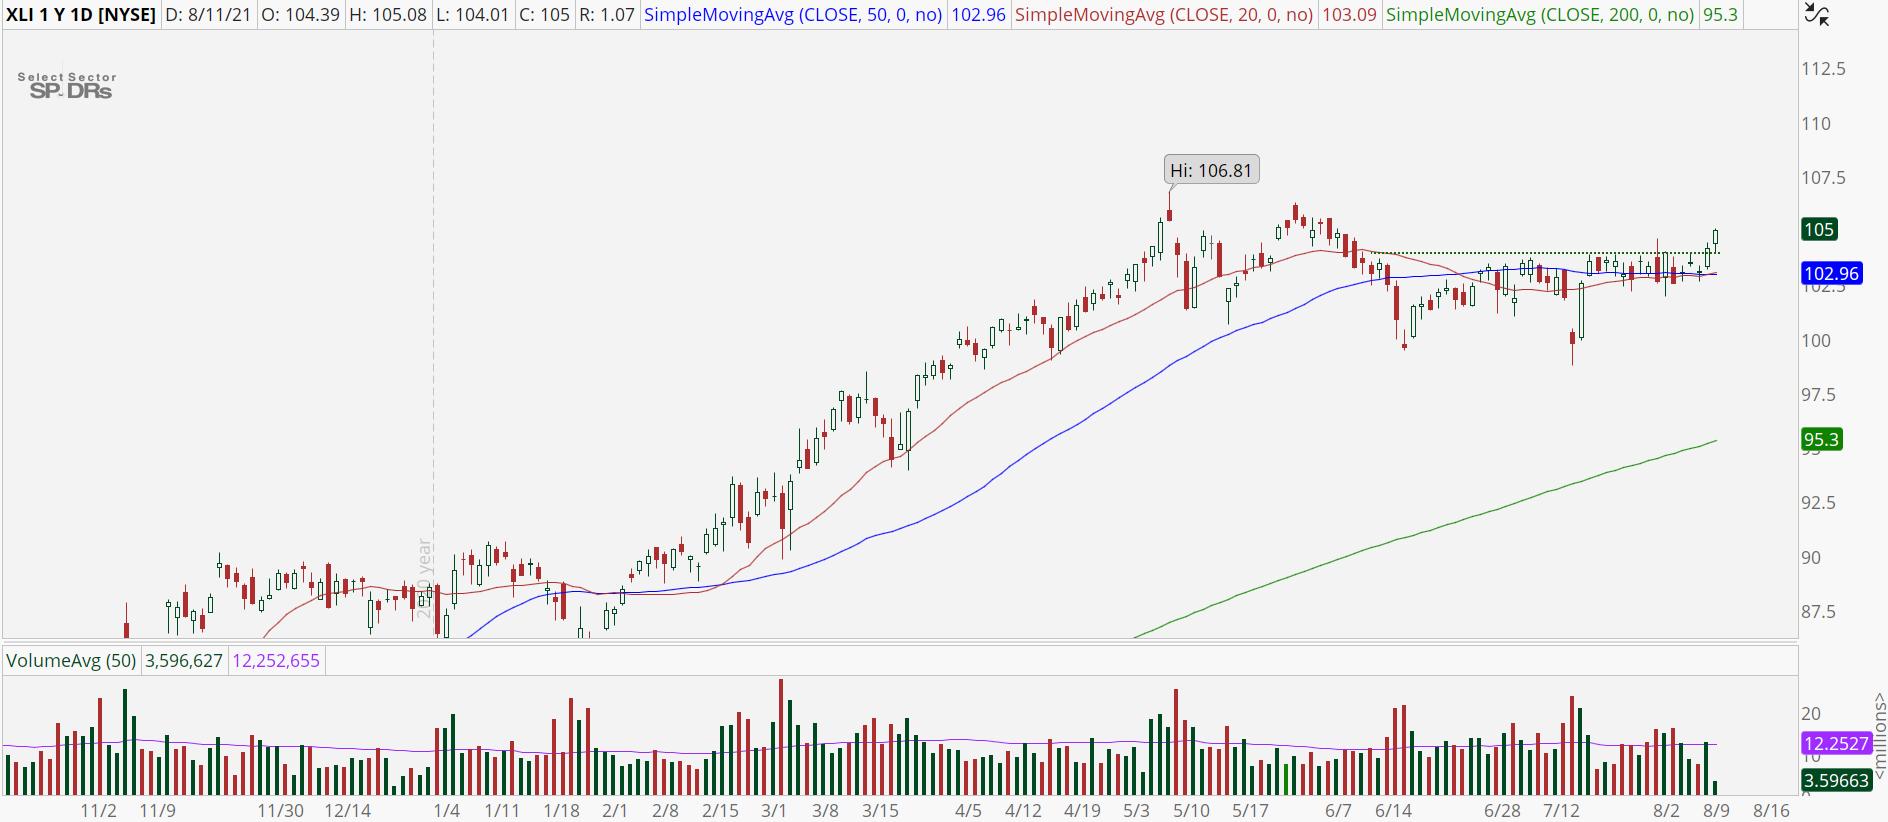 Industrials (XLI) stock chart with bullish breakout